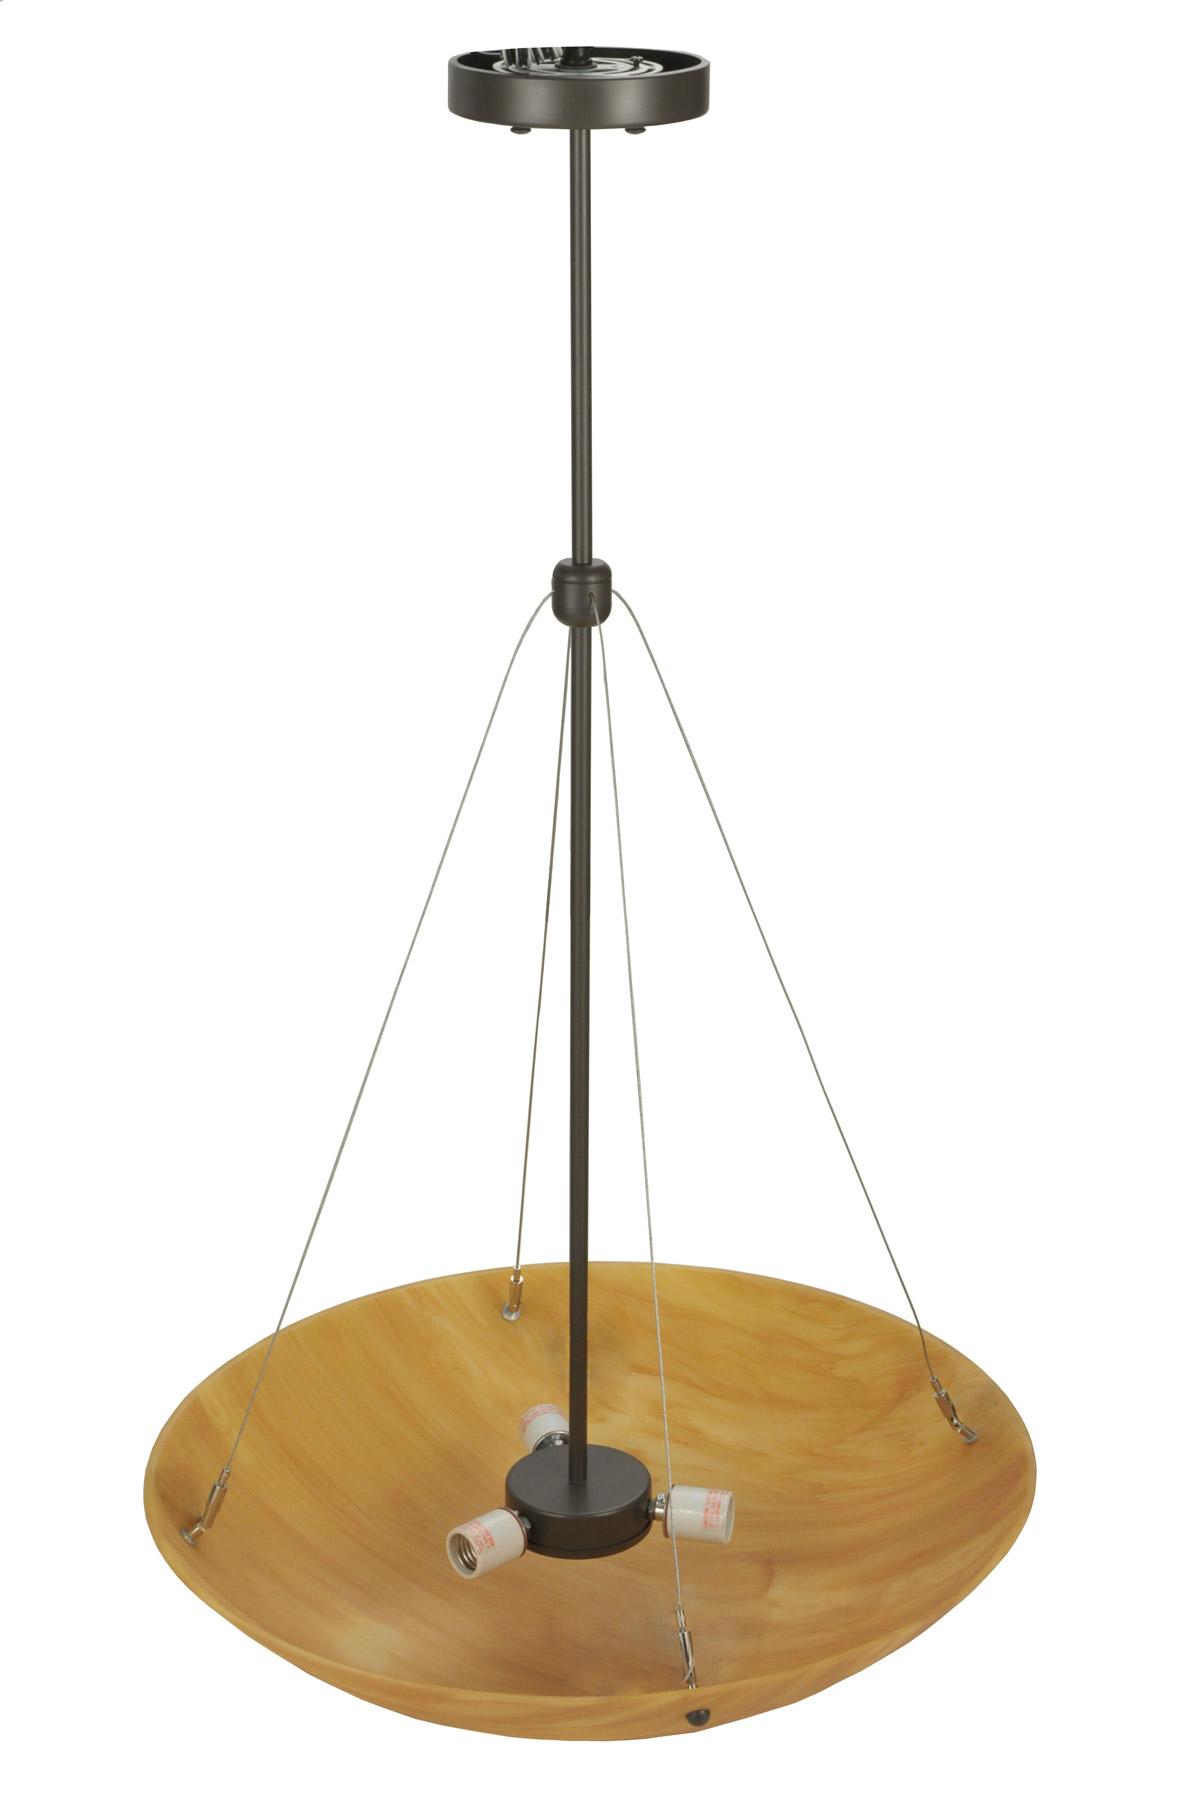 contemporary cypola 24 new mica inverted bowl pendant meyda 117684. Black Bedroom Furniture Sets. Home Design Ideas